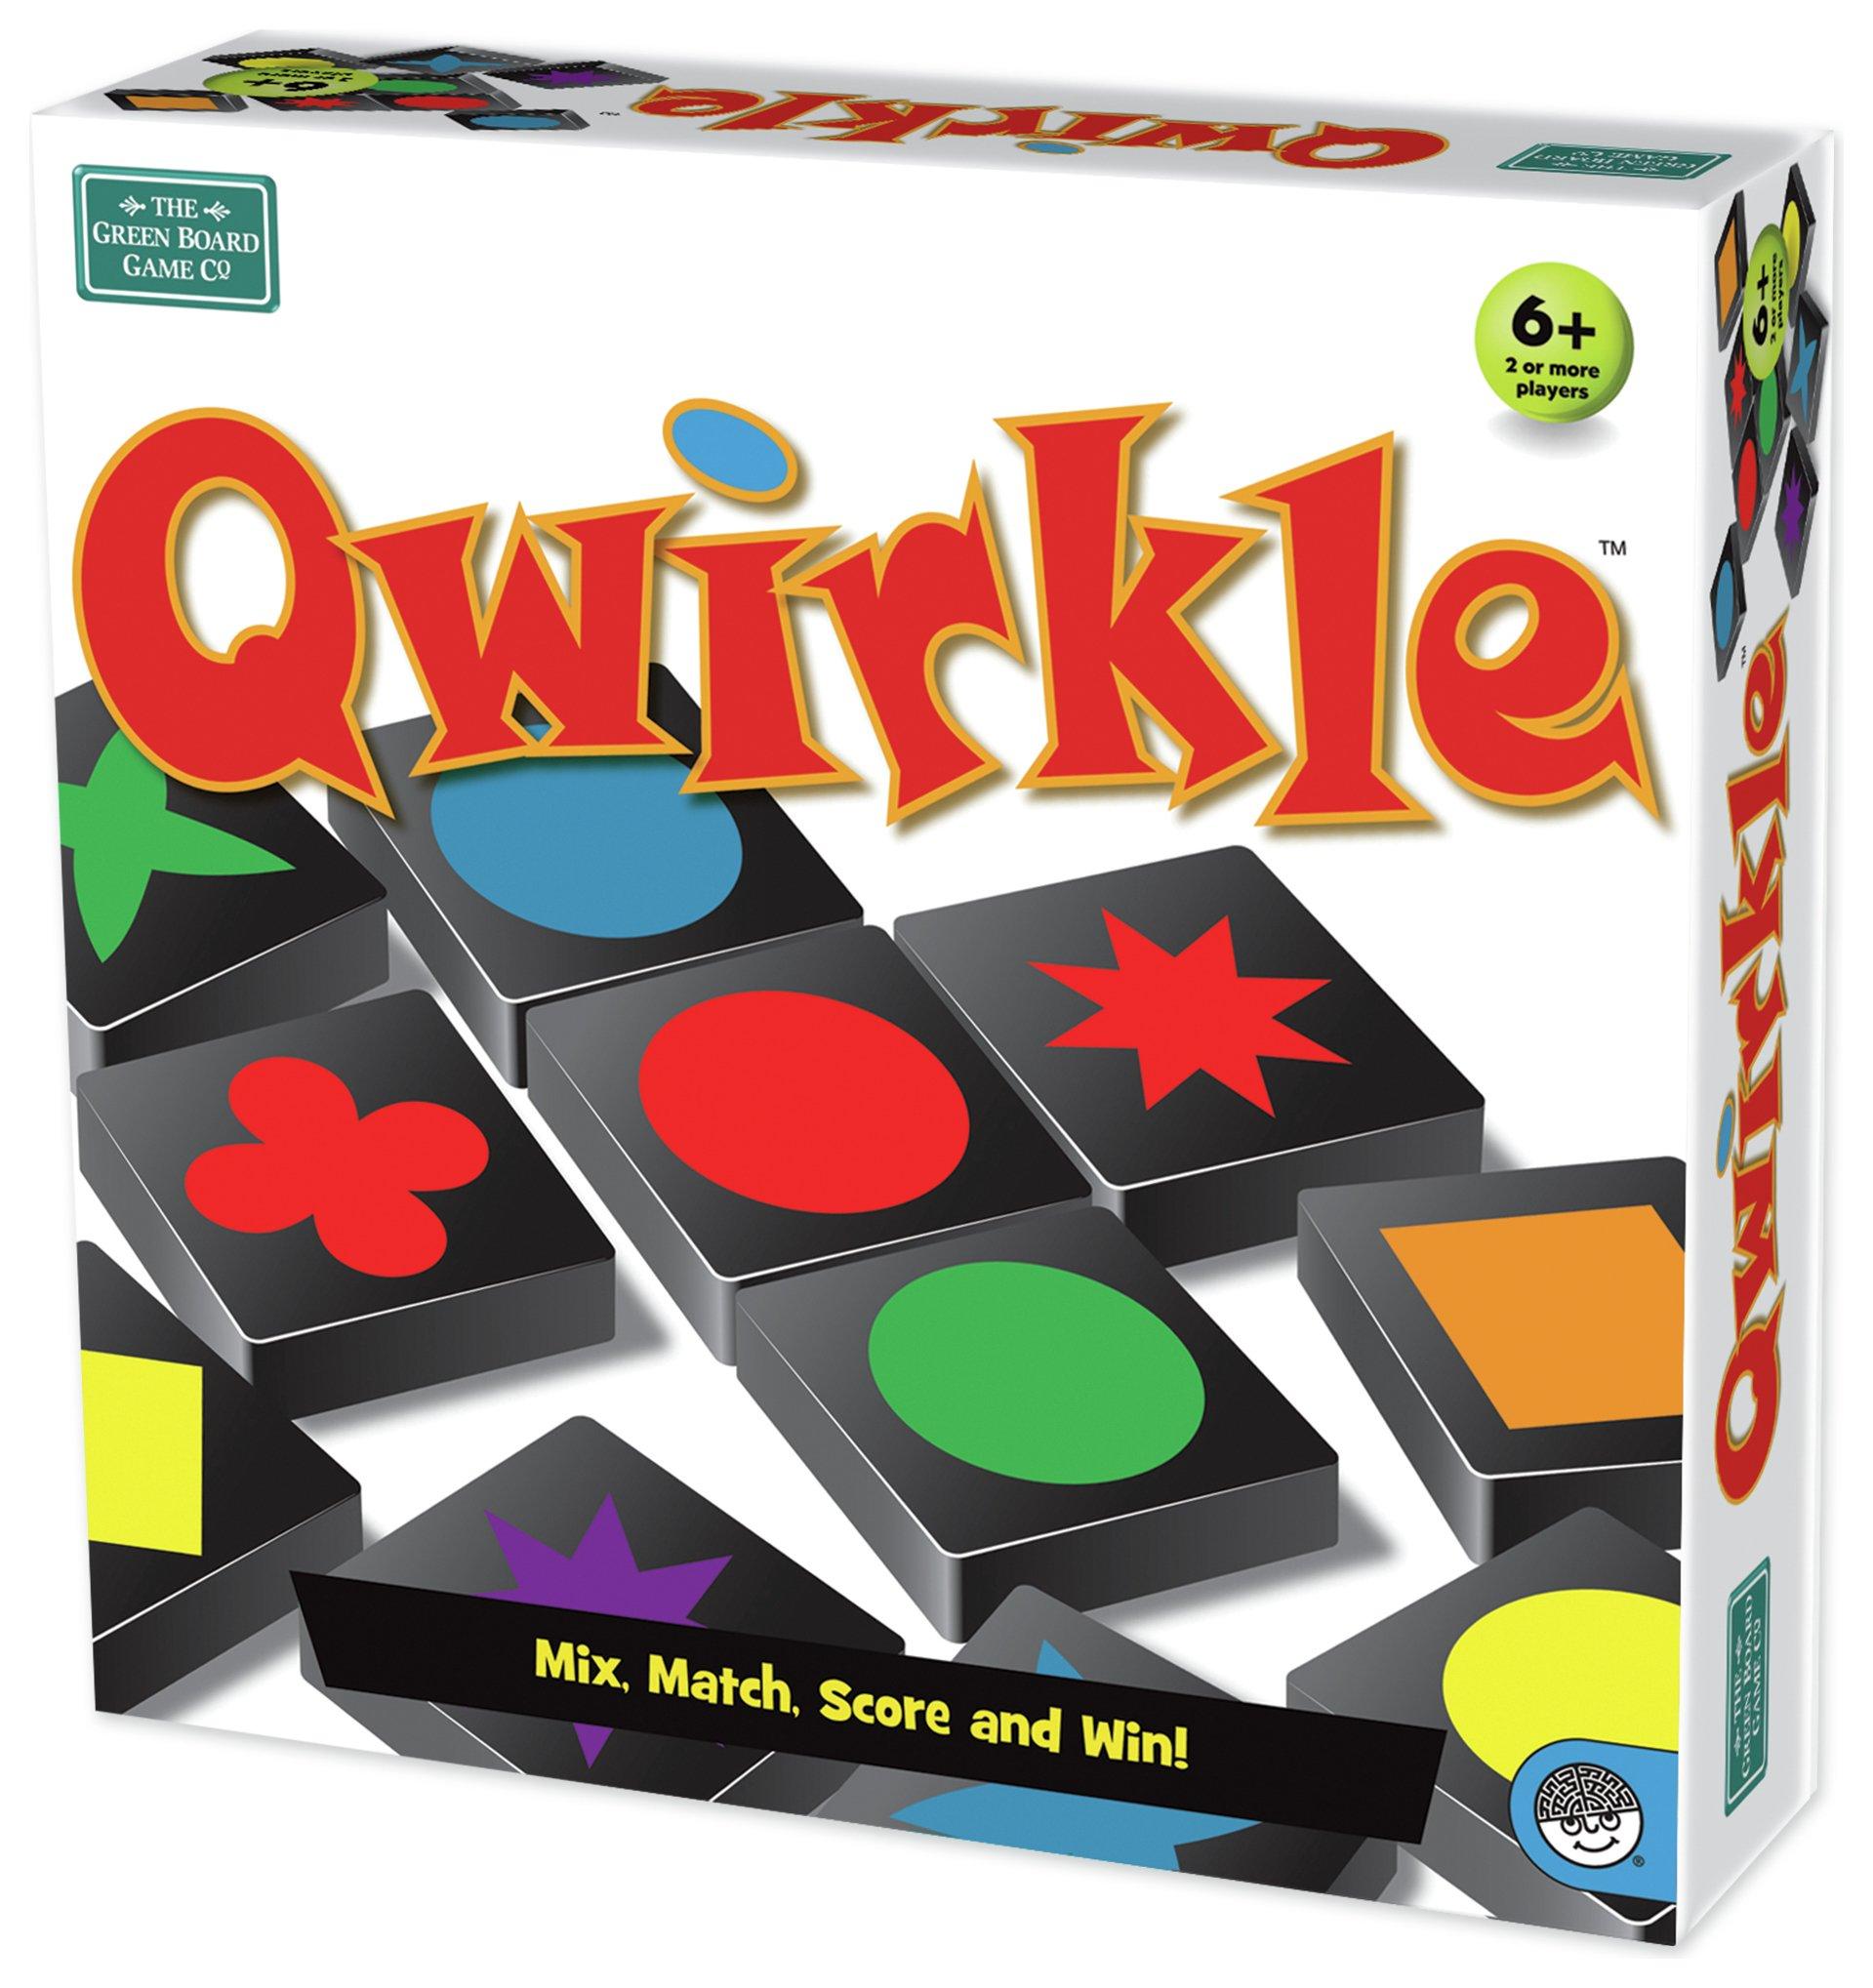 Image of Green Board Games Qwirkle